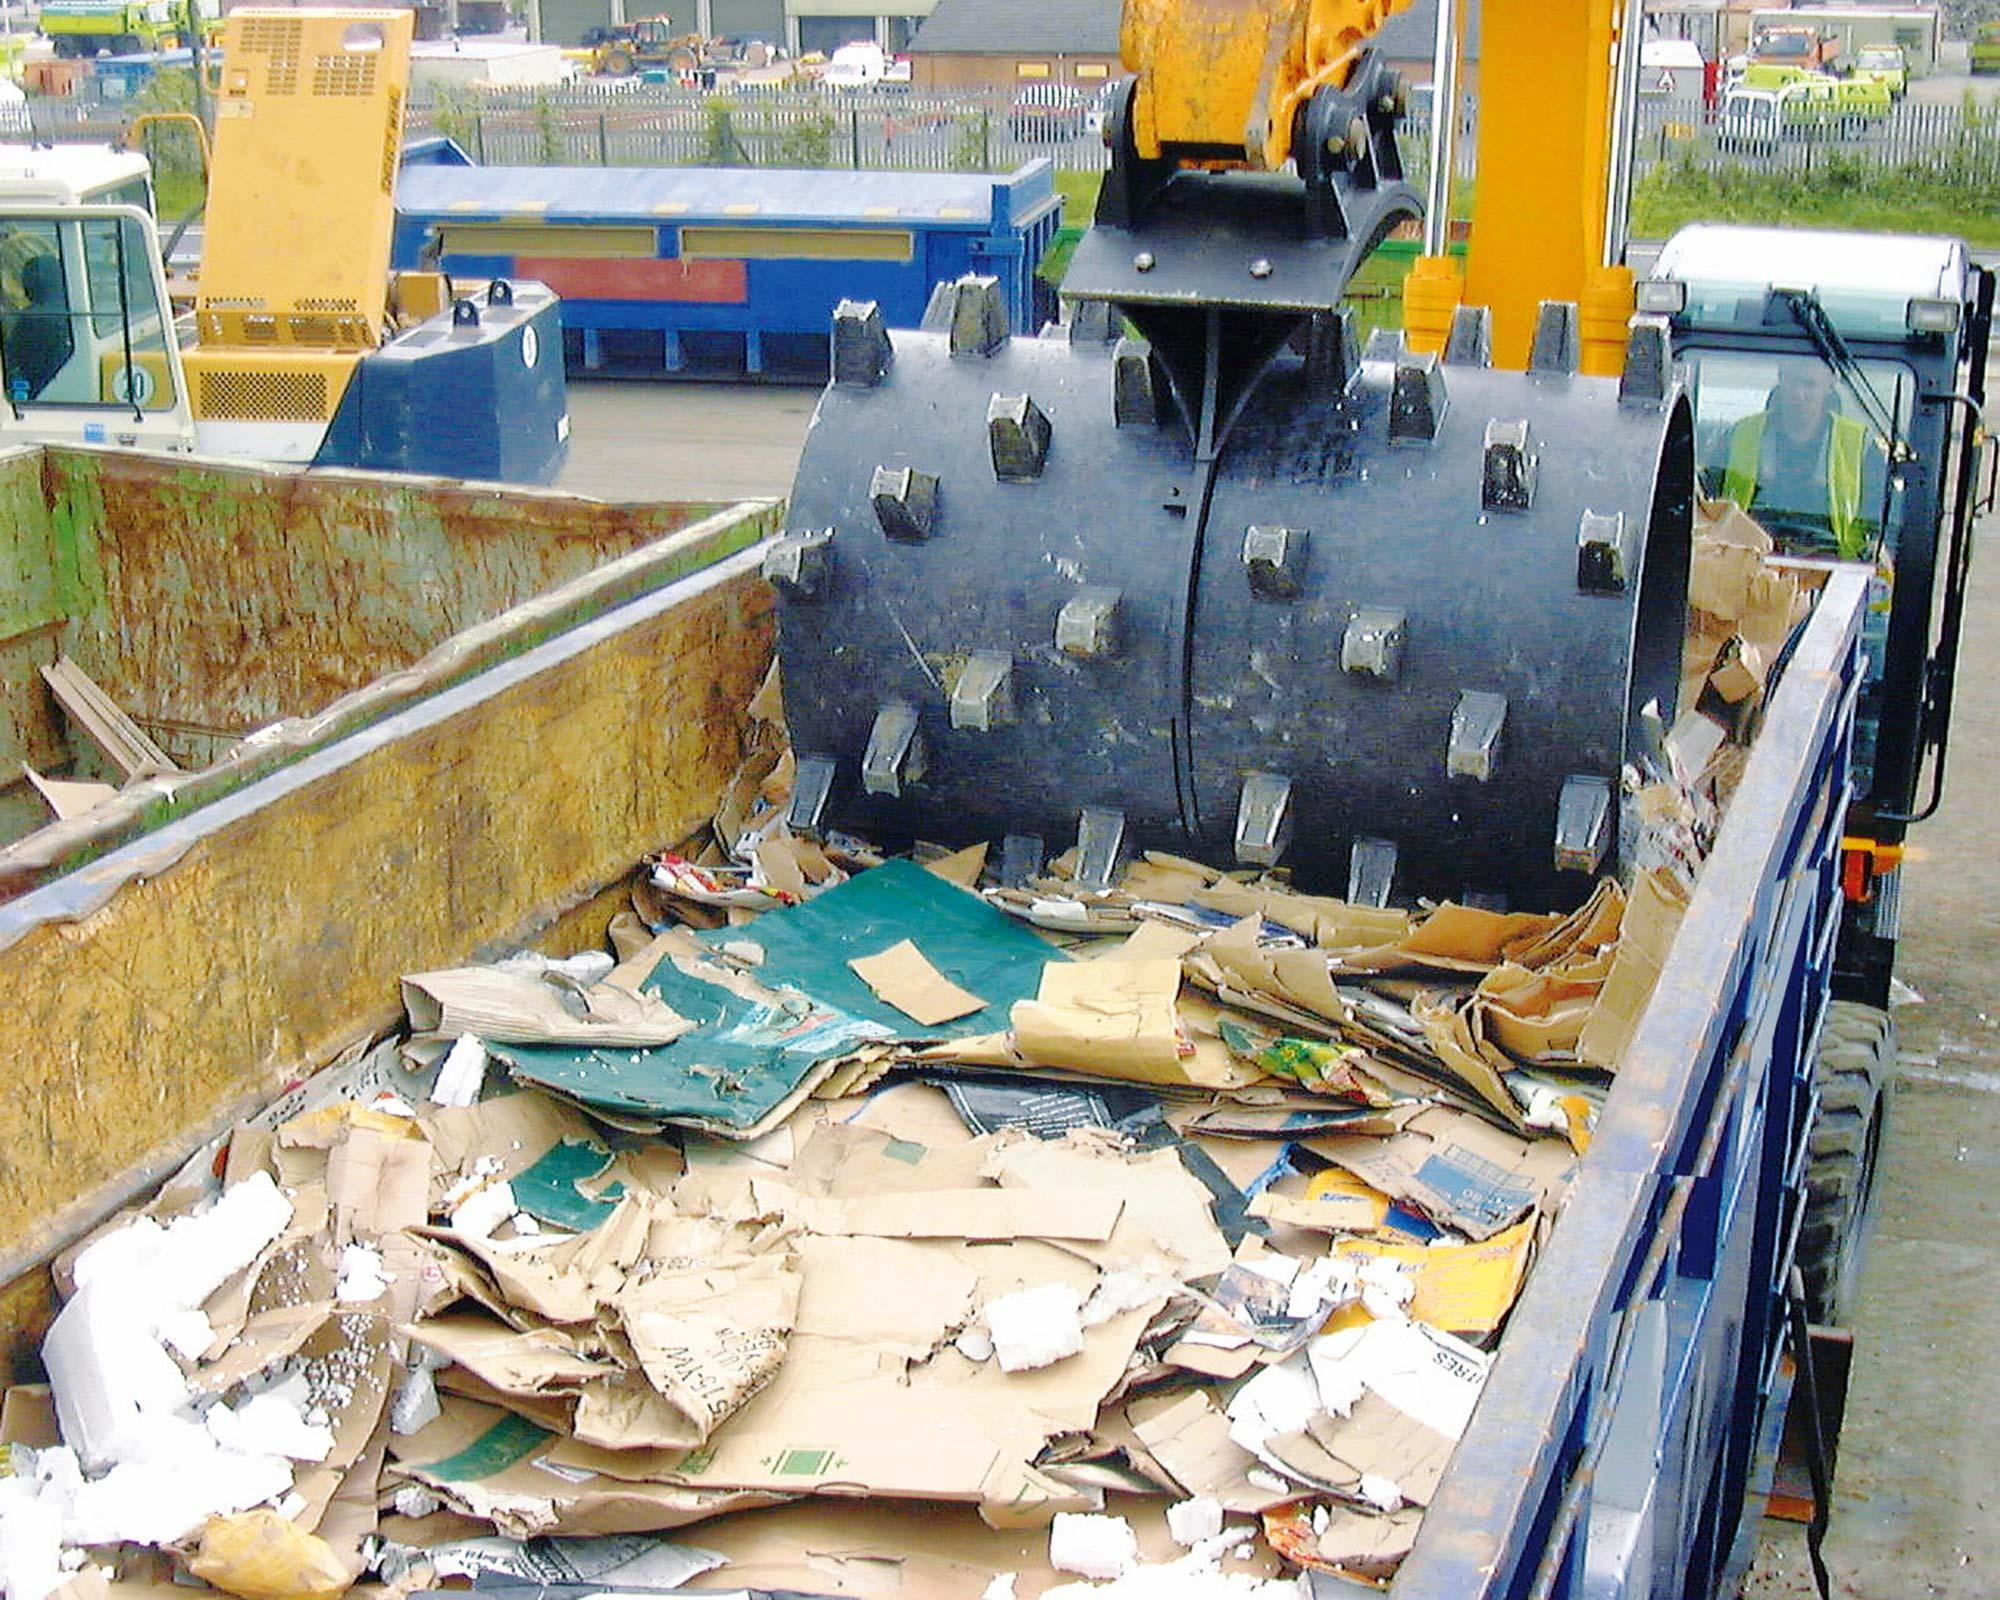 Compax crushing cardboard